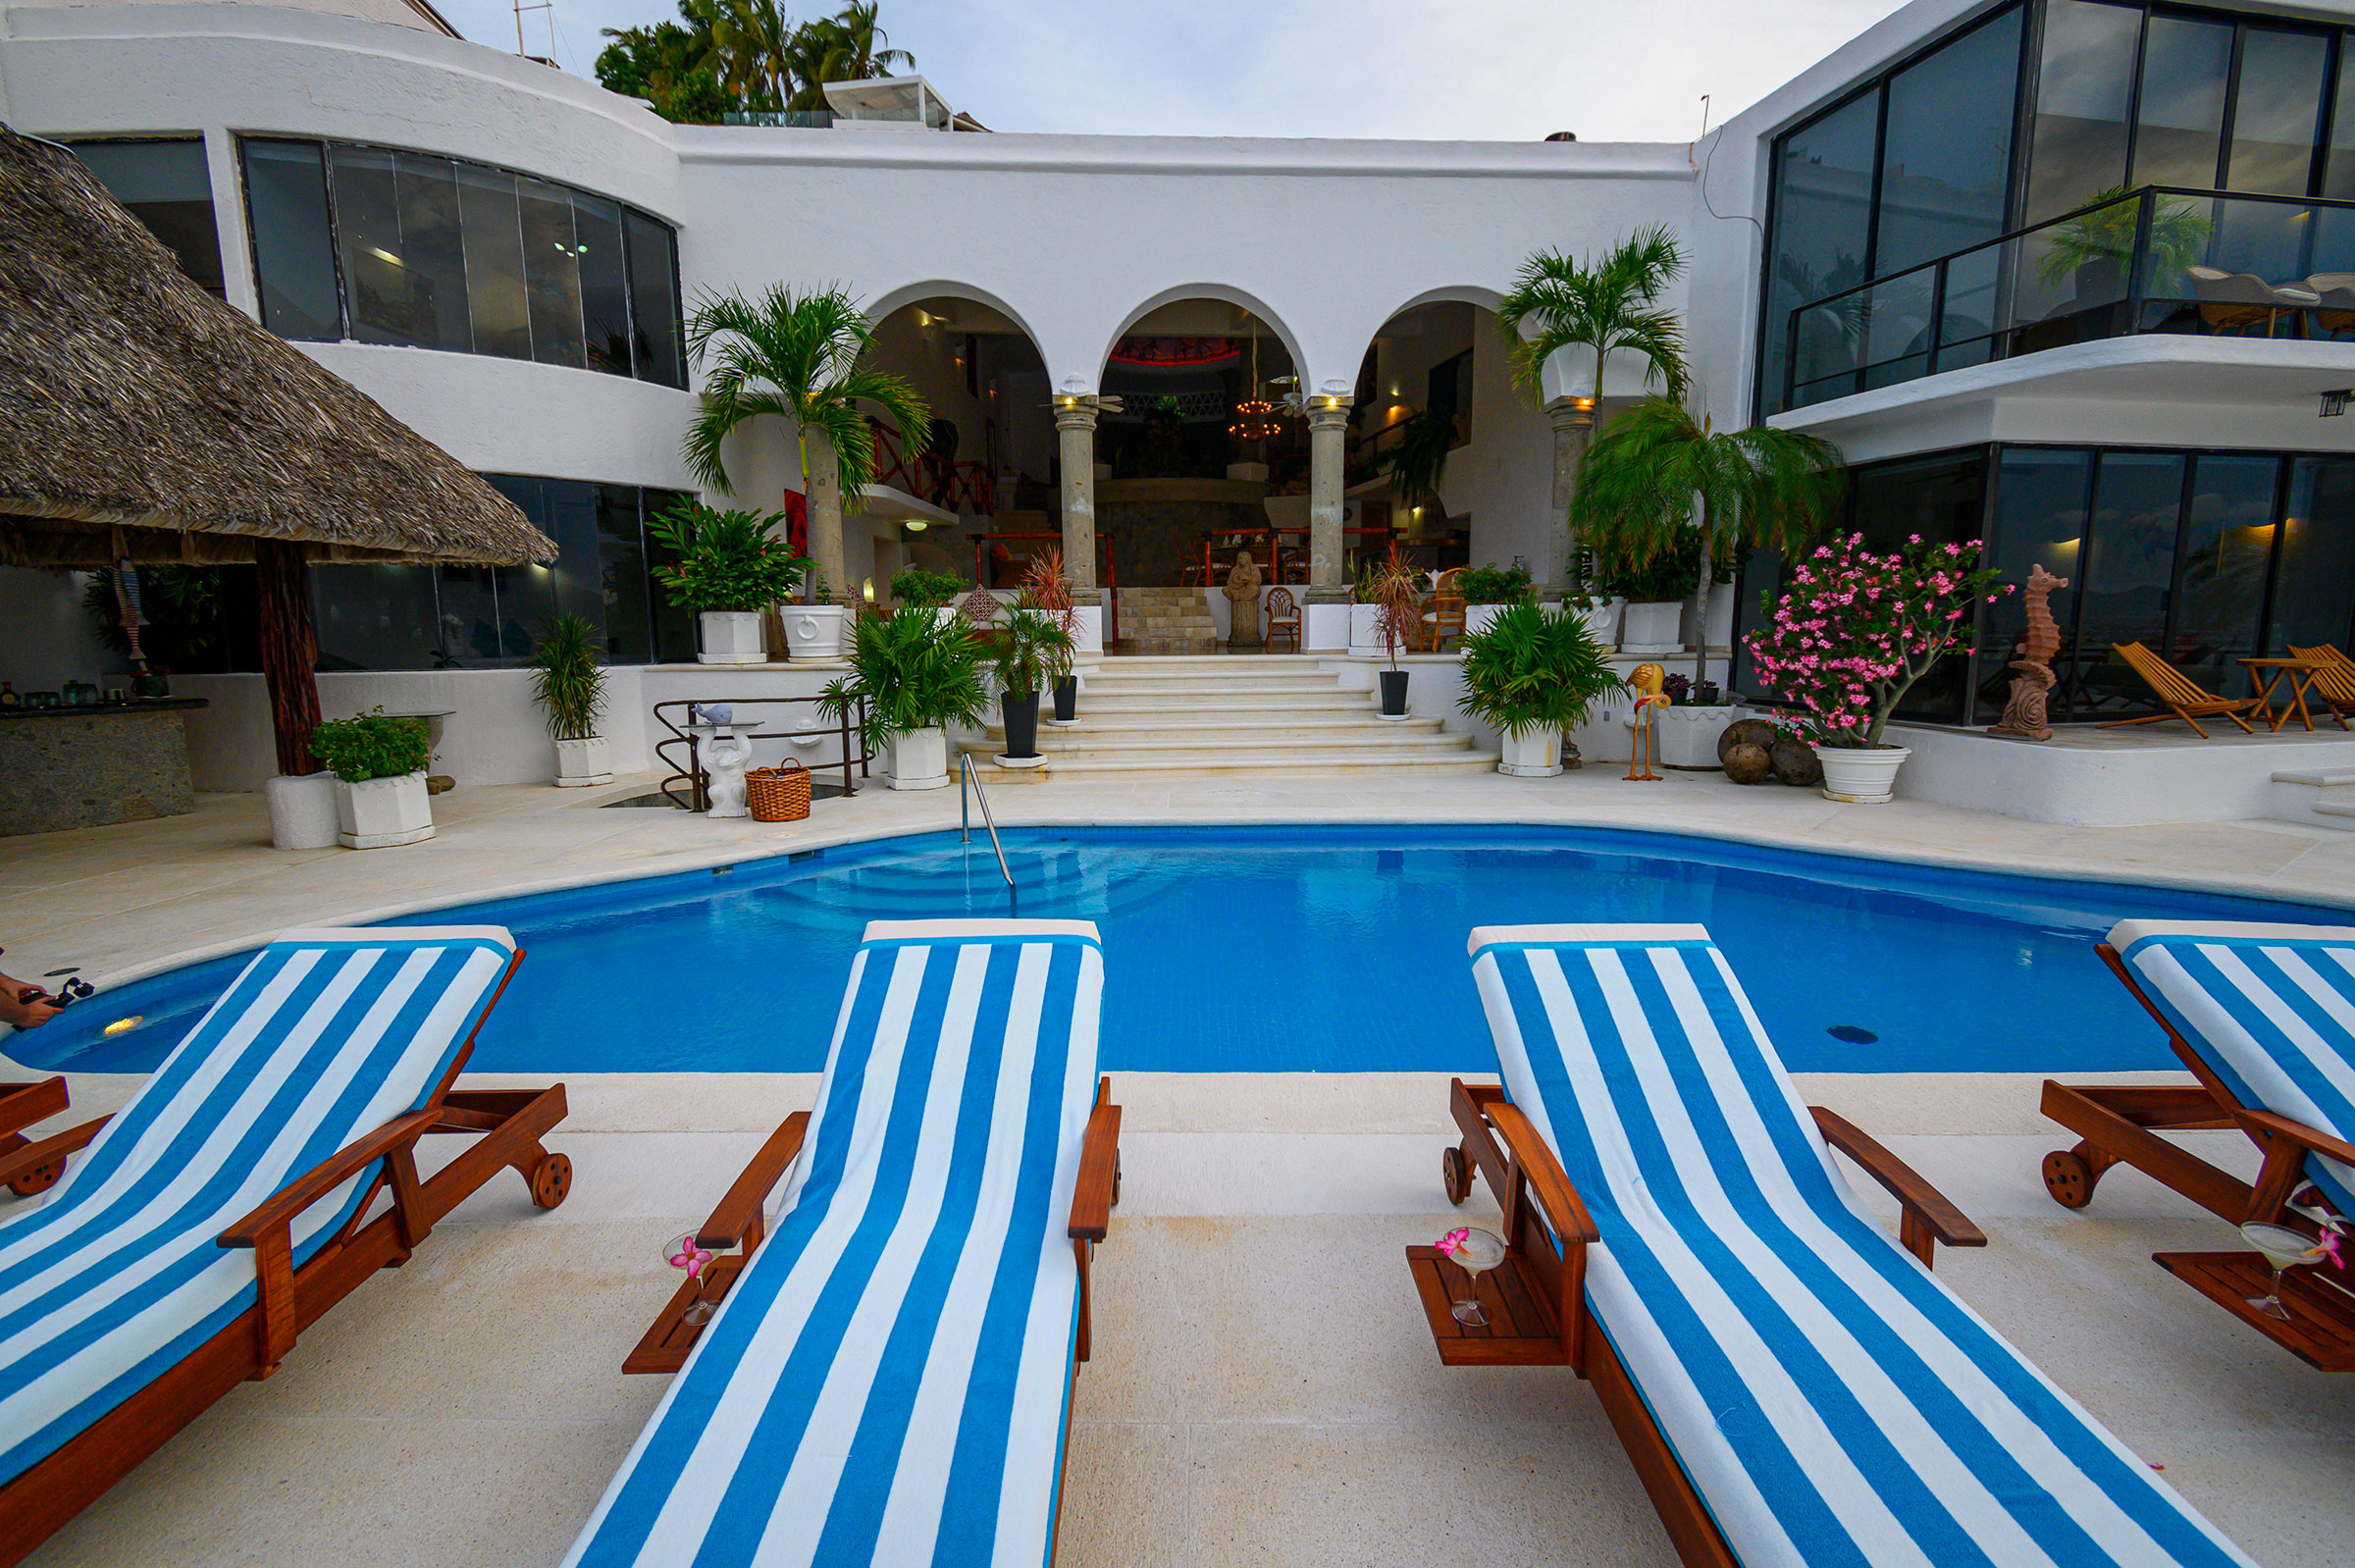 Área de piscina en Casa Buenos Aires, Acapulco